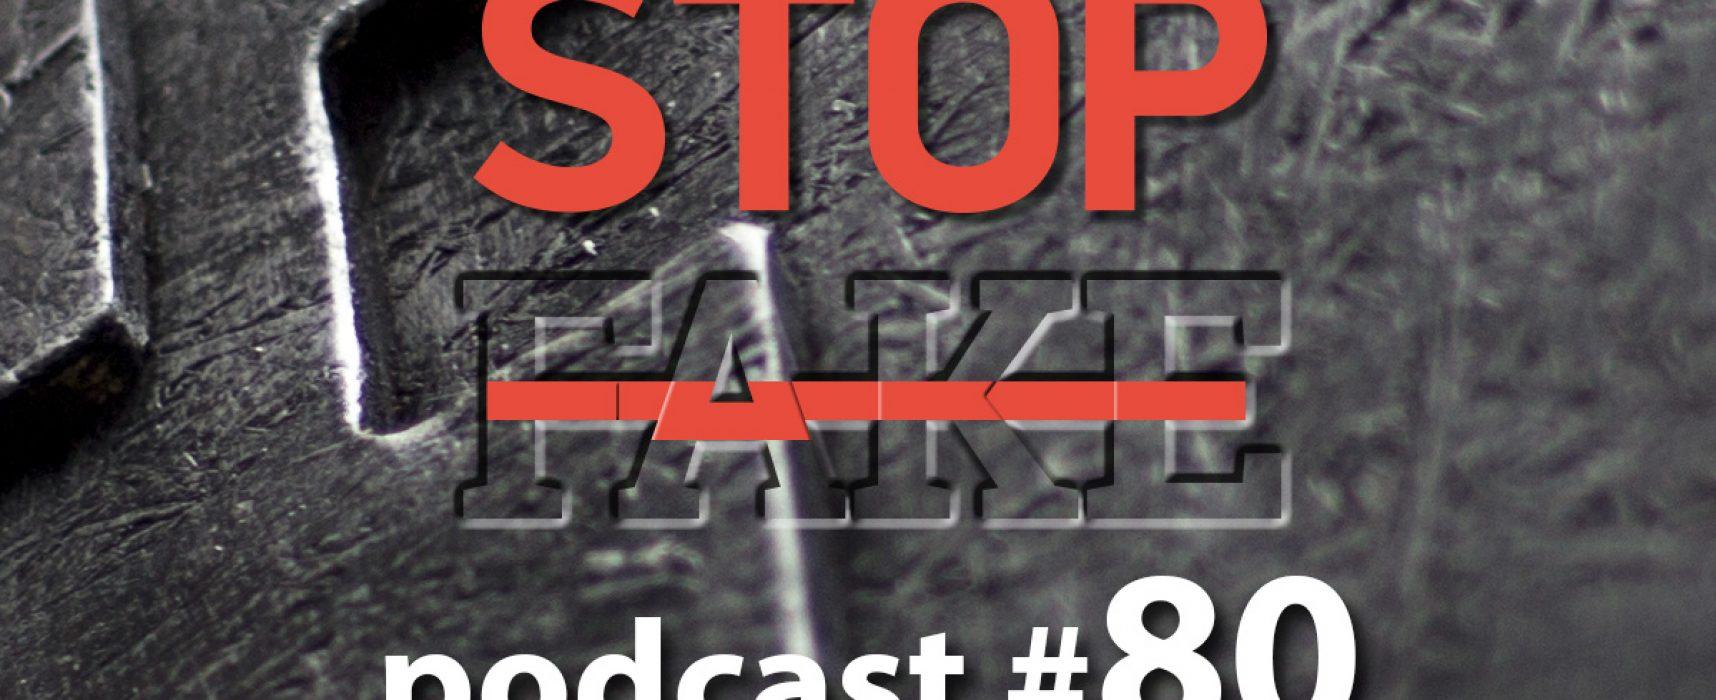 StopFake podcast #80